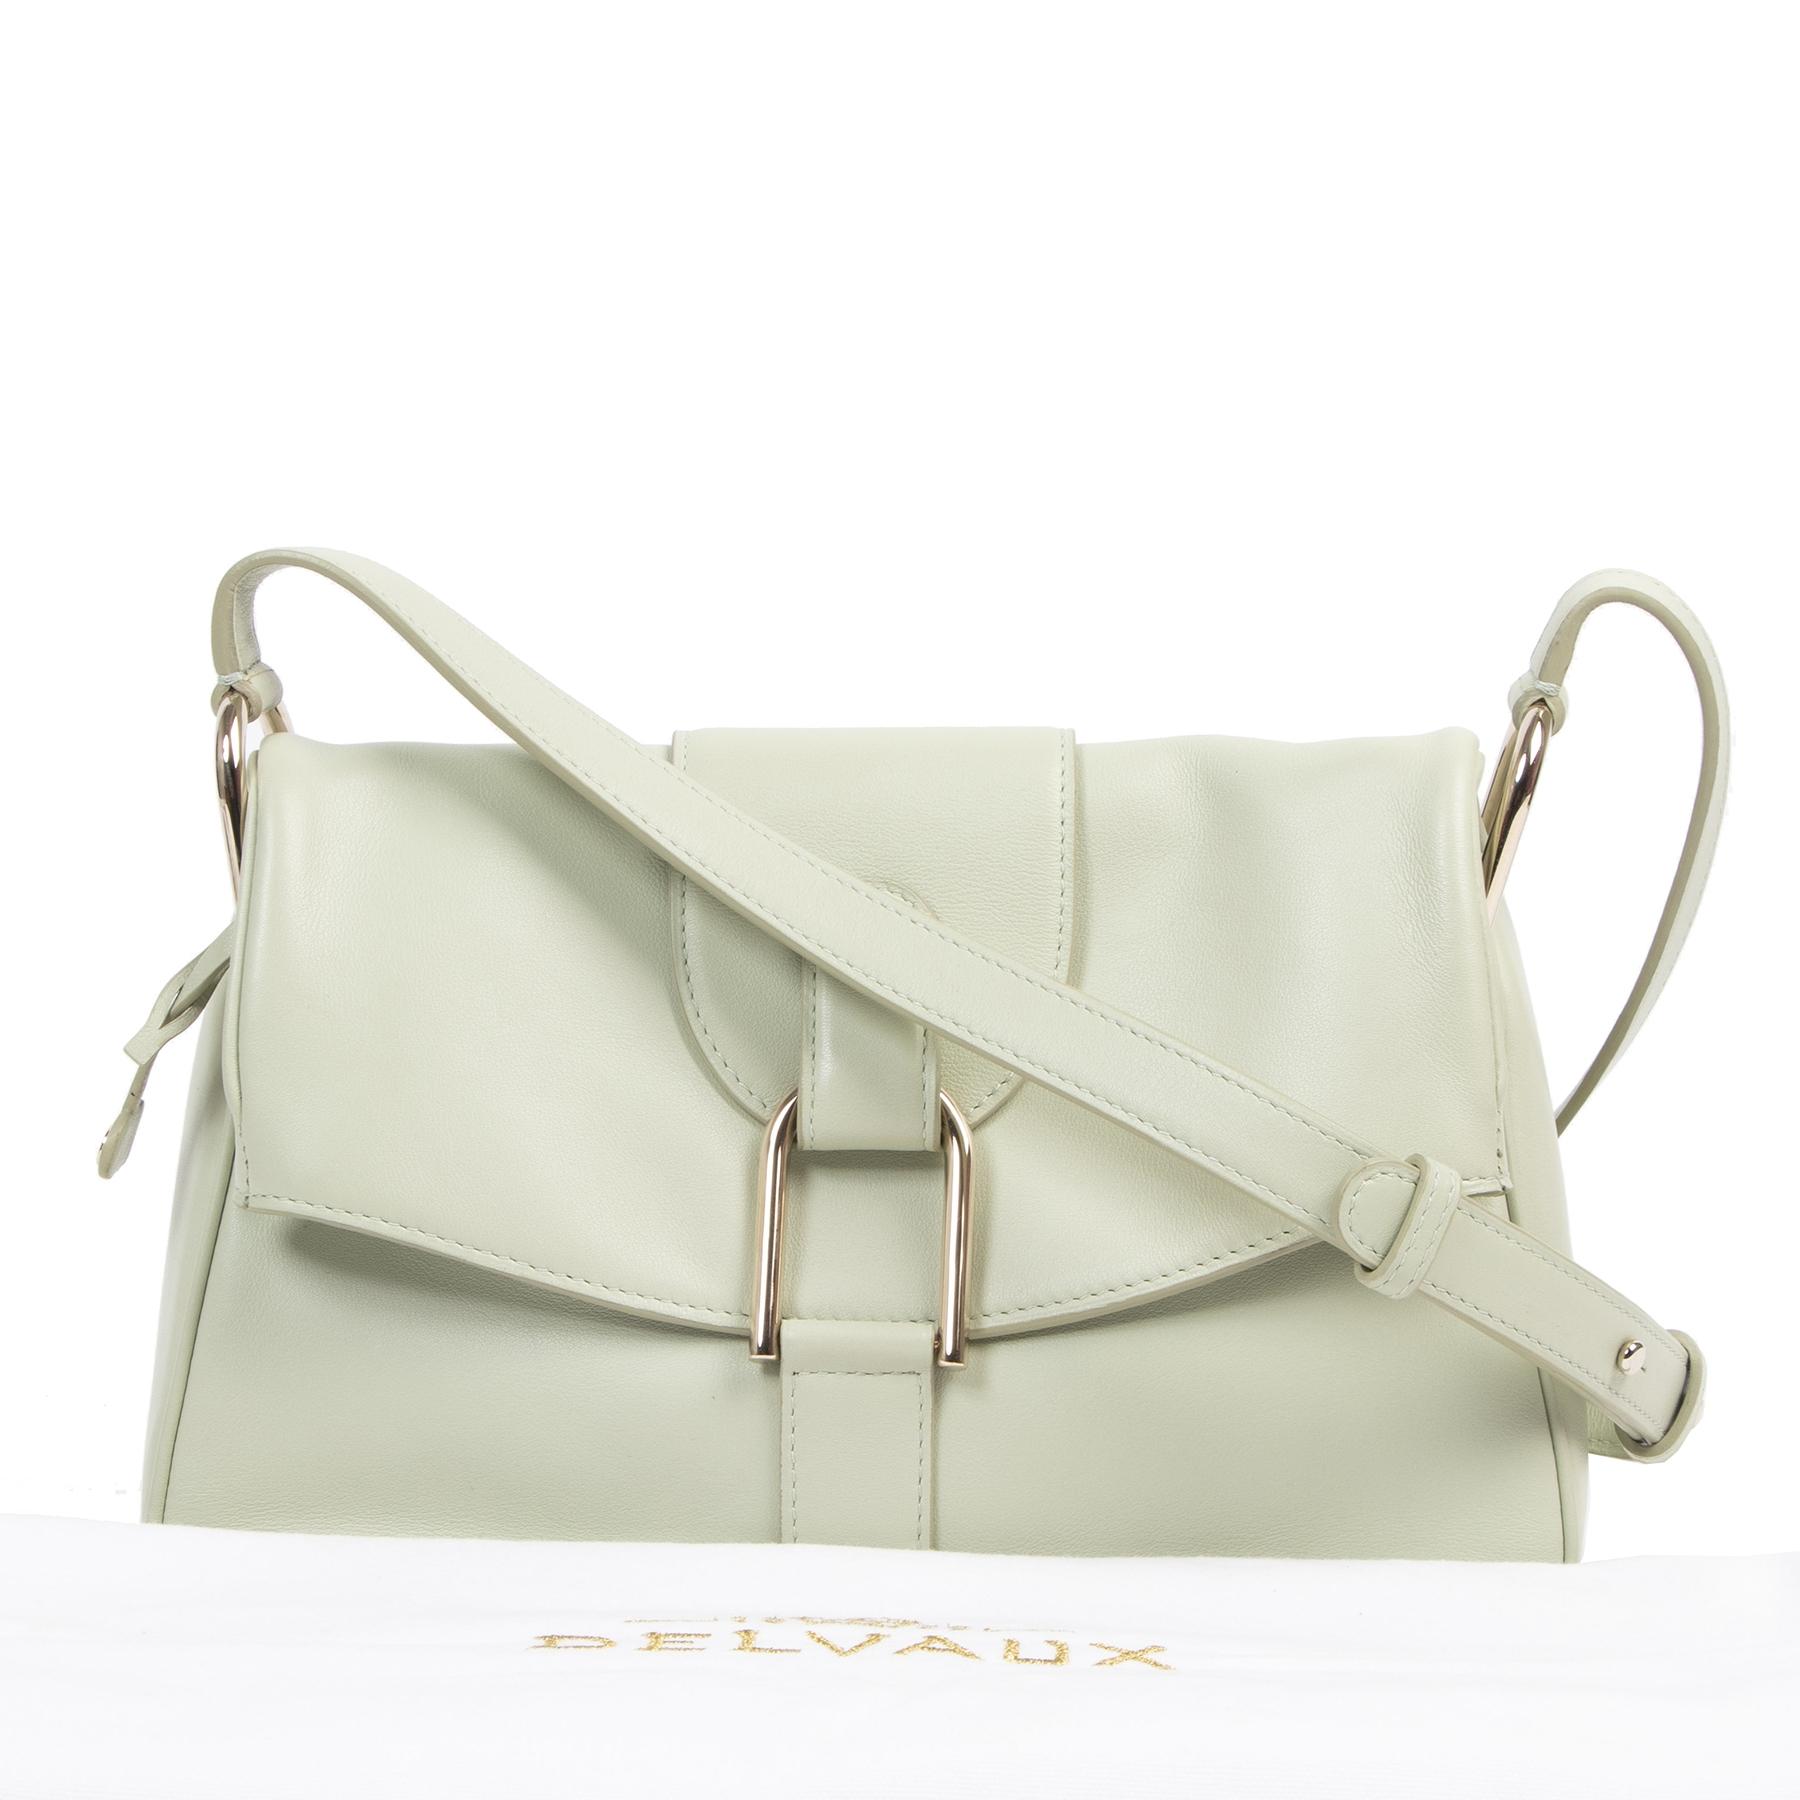 Authentieke tweedehands vintage Delvaux Mint Givry Crossbody Bag koop online webshop LabelLOV